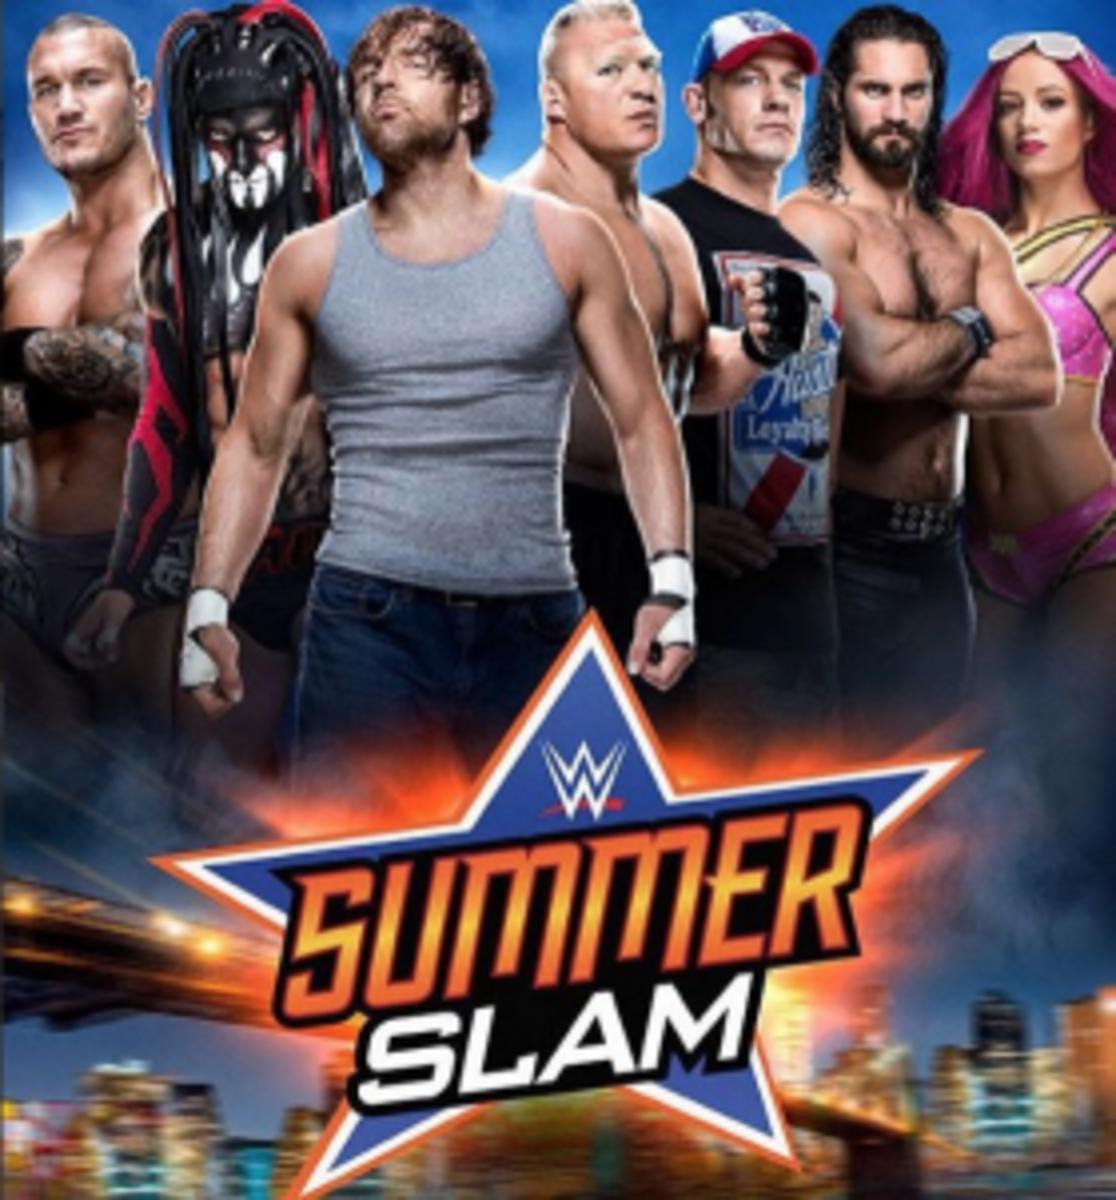 New SummerSlam Promo Poster